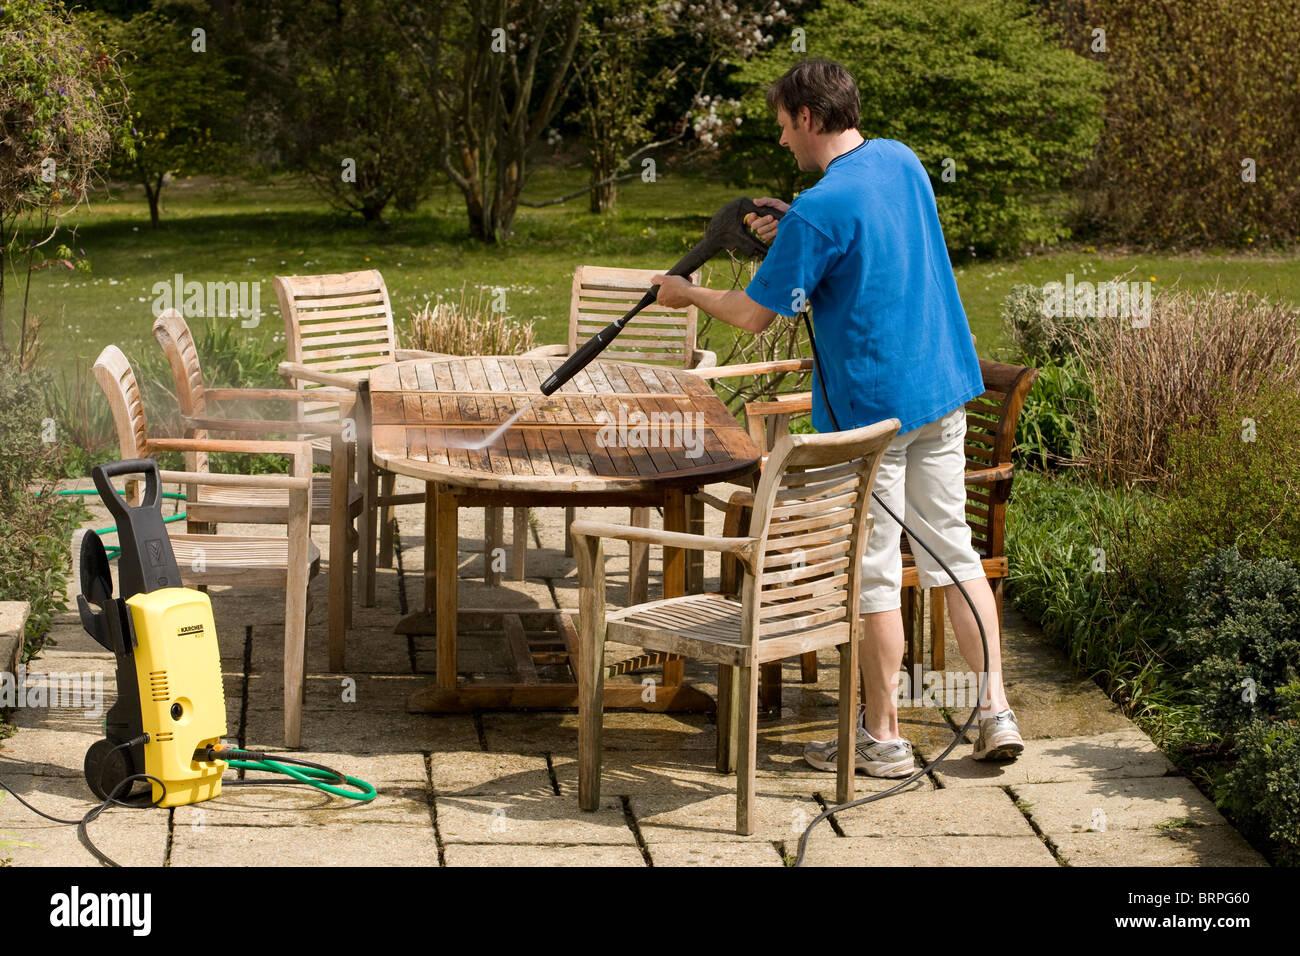 Man using a pressure washer to clean teak wood garden furniture - Man Using A Pressure Washer To Clean Teak Wood Garden Furniture